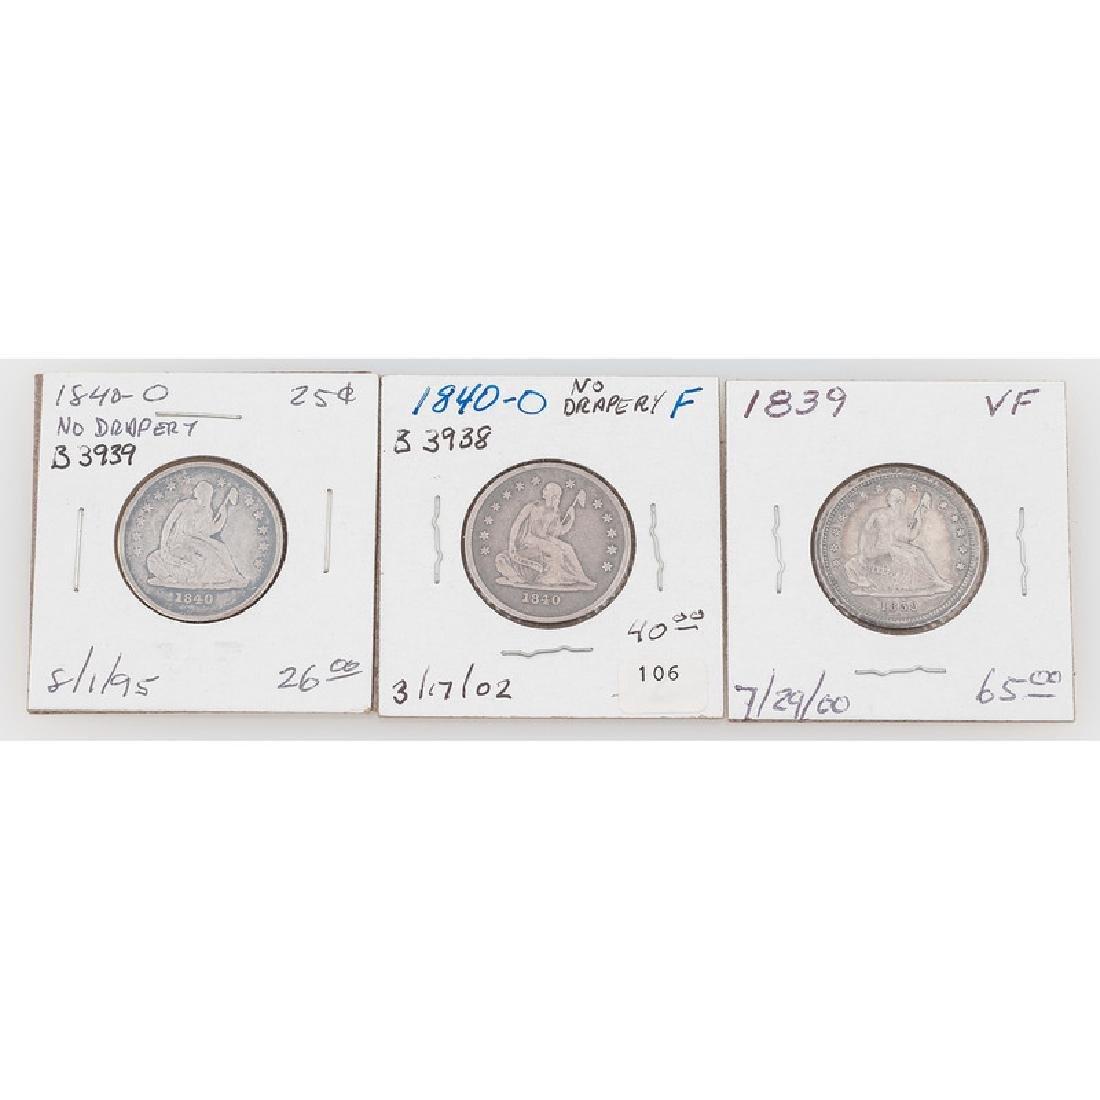 Liberty Seated Quarter Dollars 1839-1840